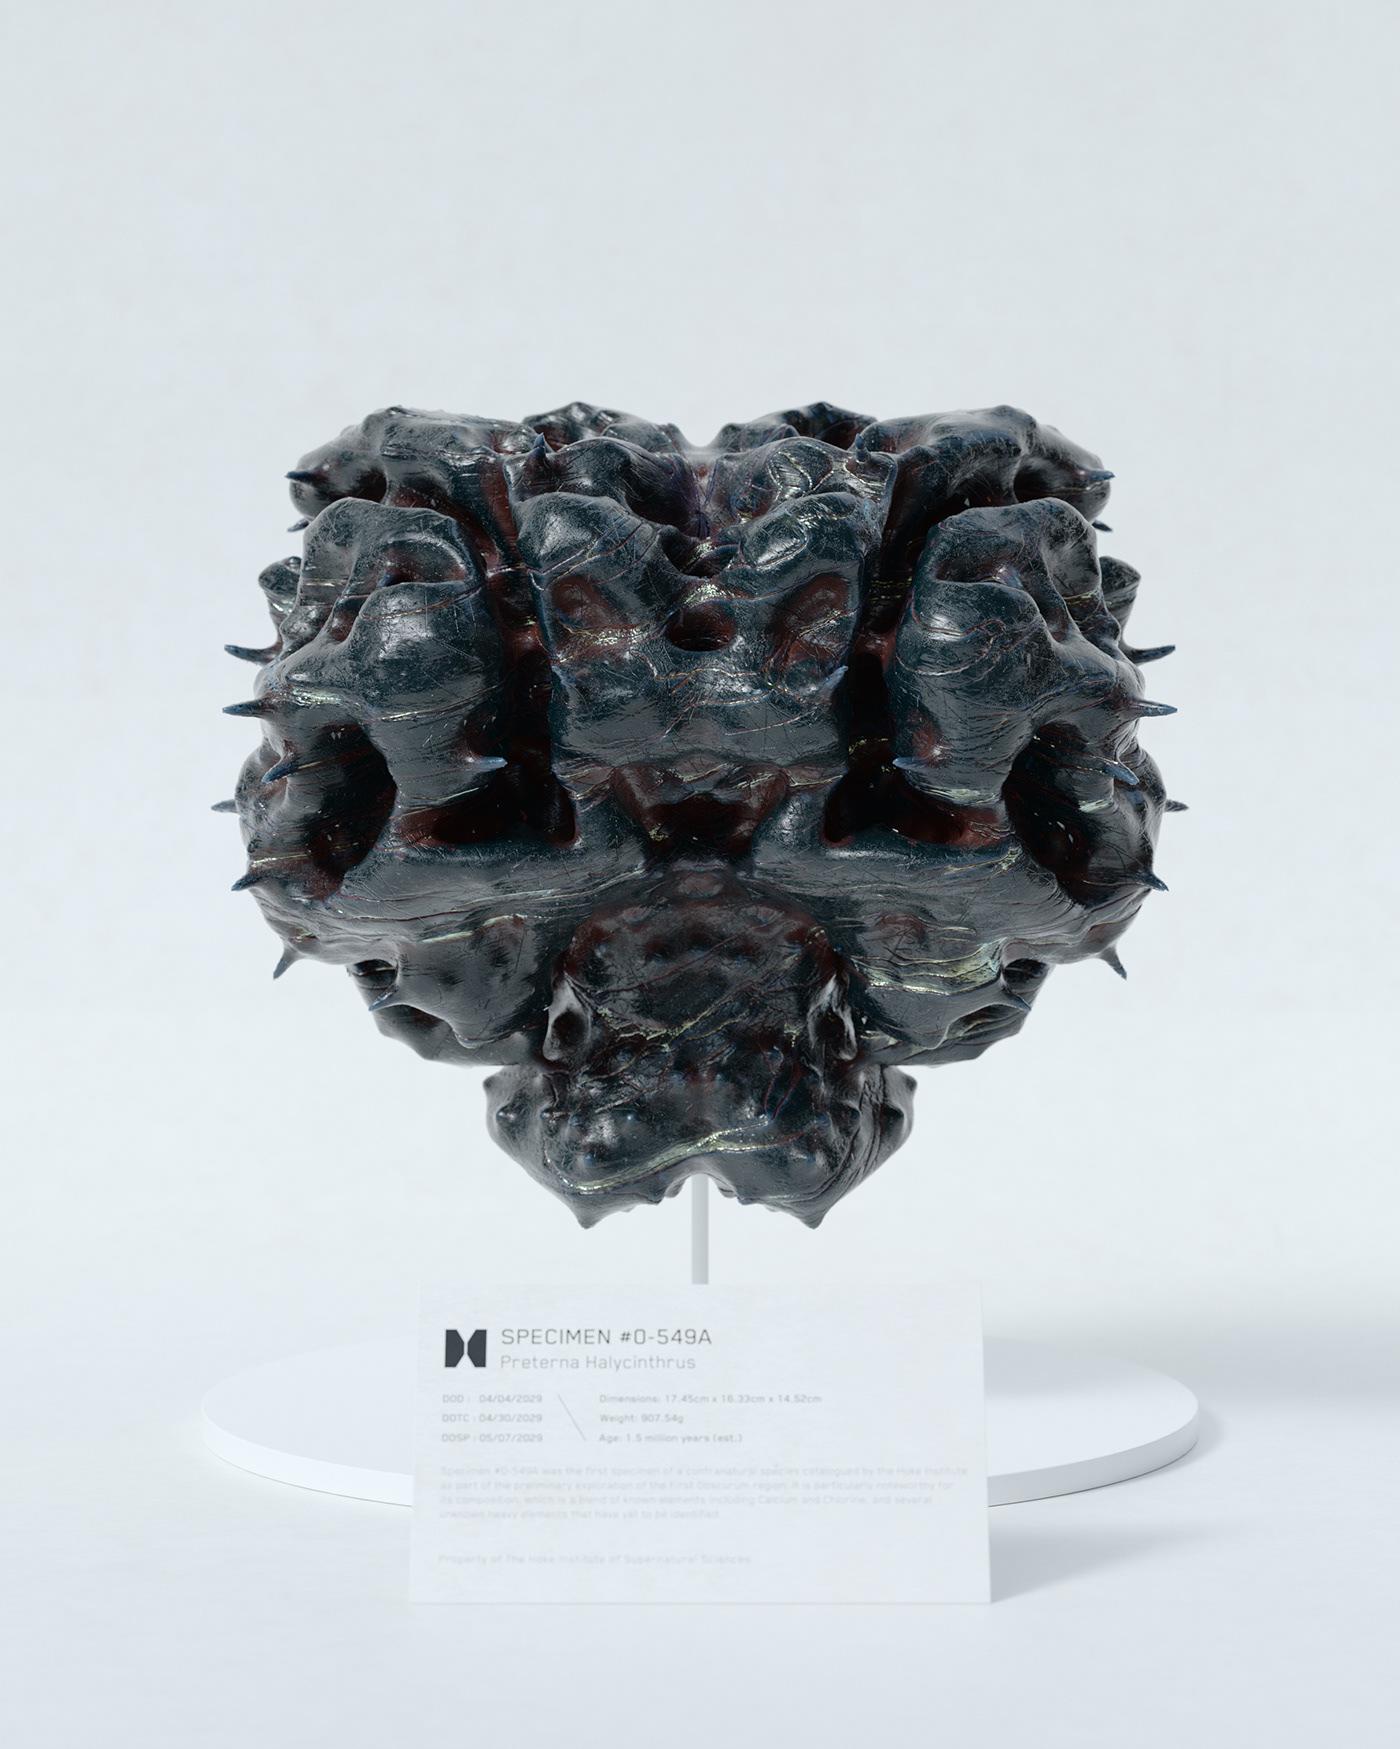 generative design Procedural HoudiniFX concept art 3D rendering abstract Scifi science fiction skull